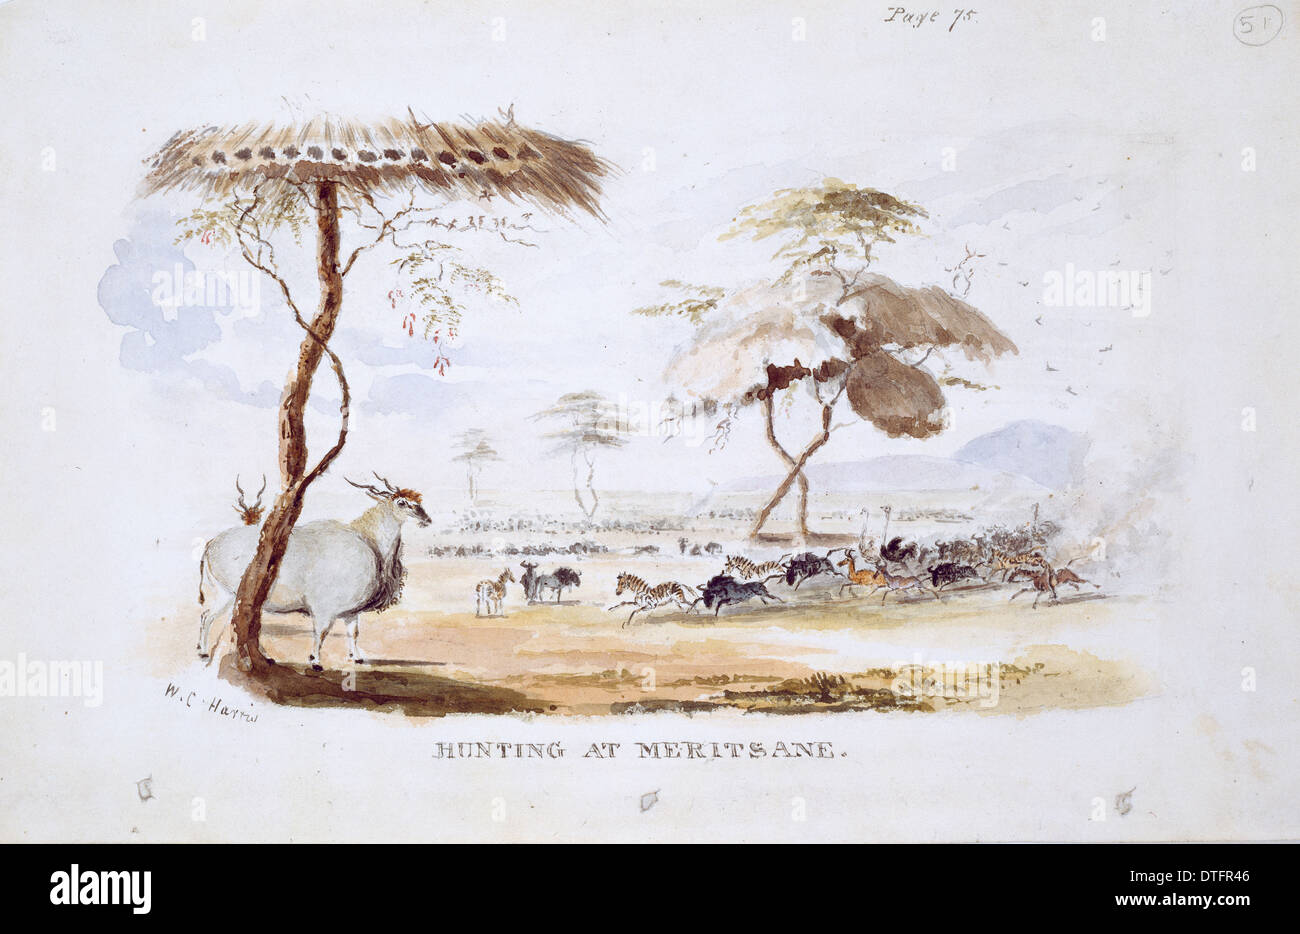 Hunting at Meritsane (Plate 51/52) - Stock Image